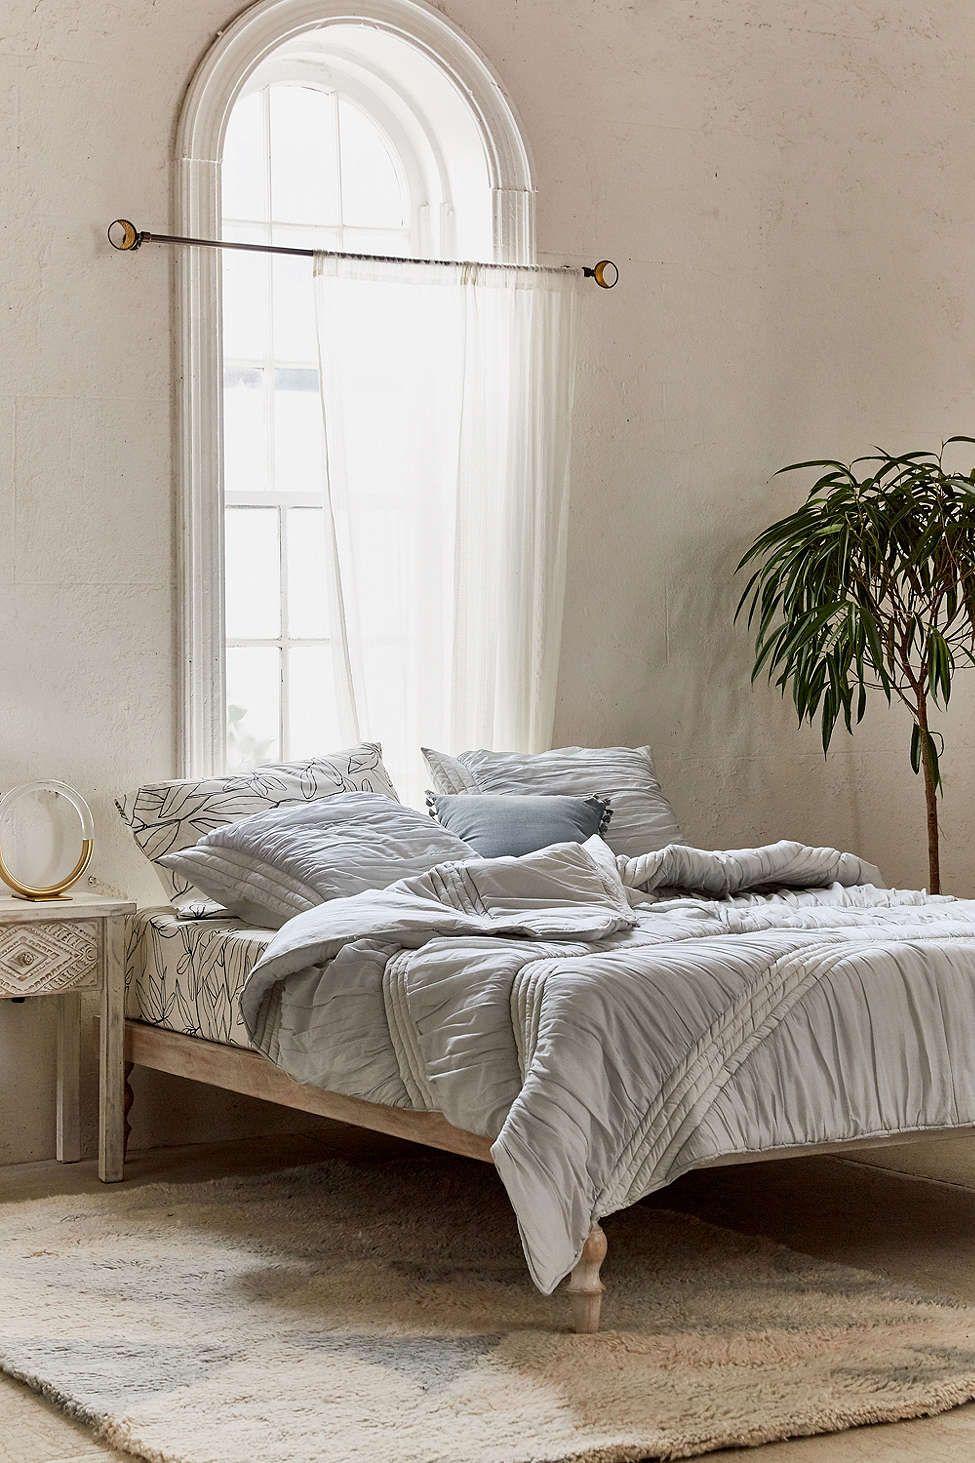 Ruffle Comforter Ruffle Comforter dream Bedroom